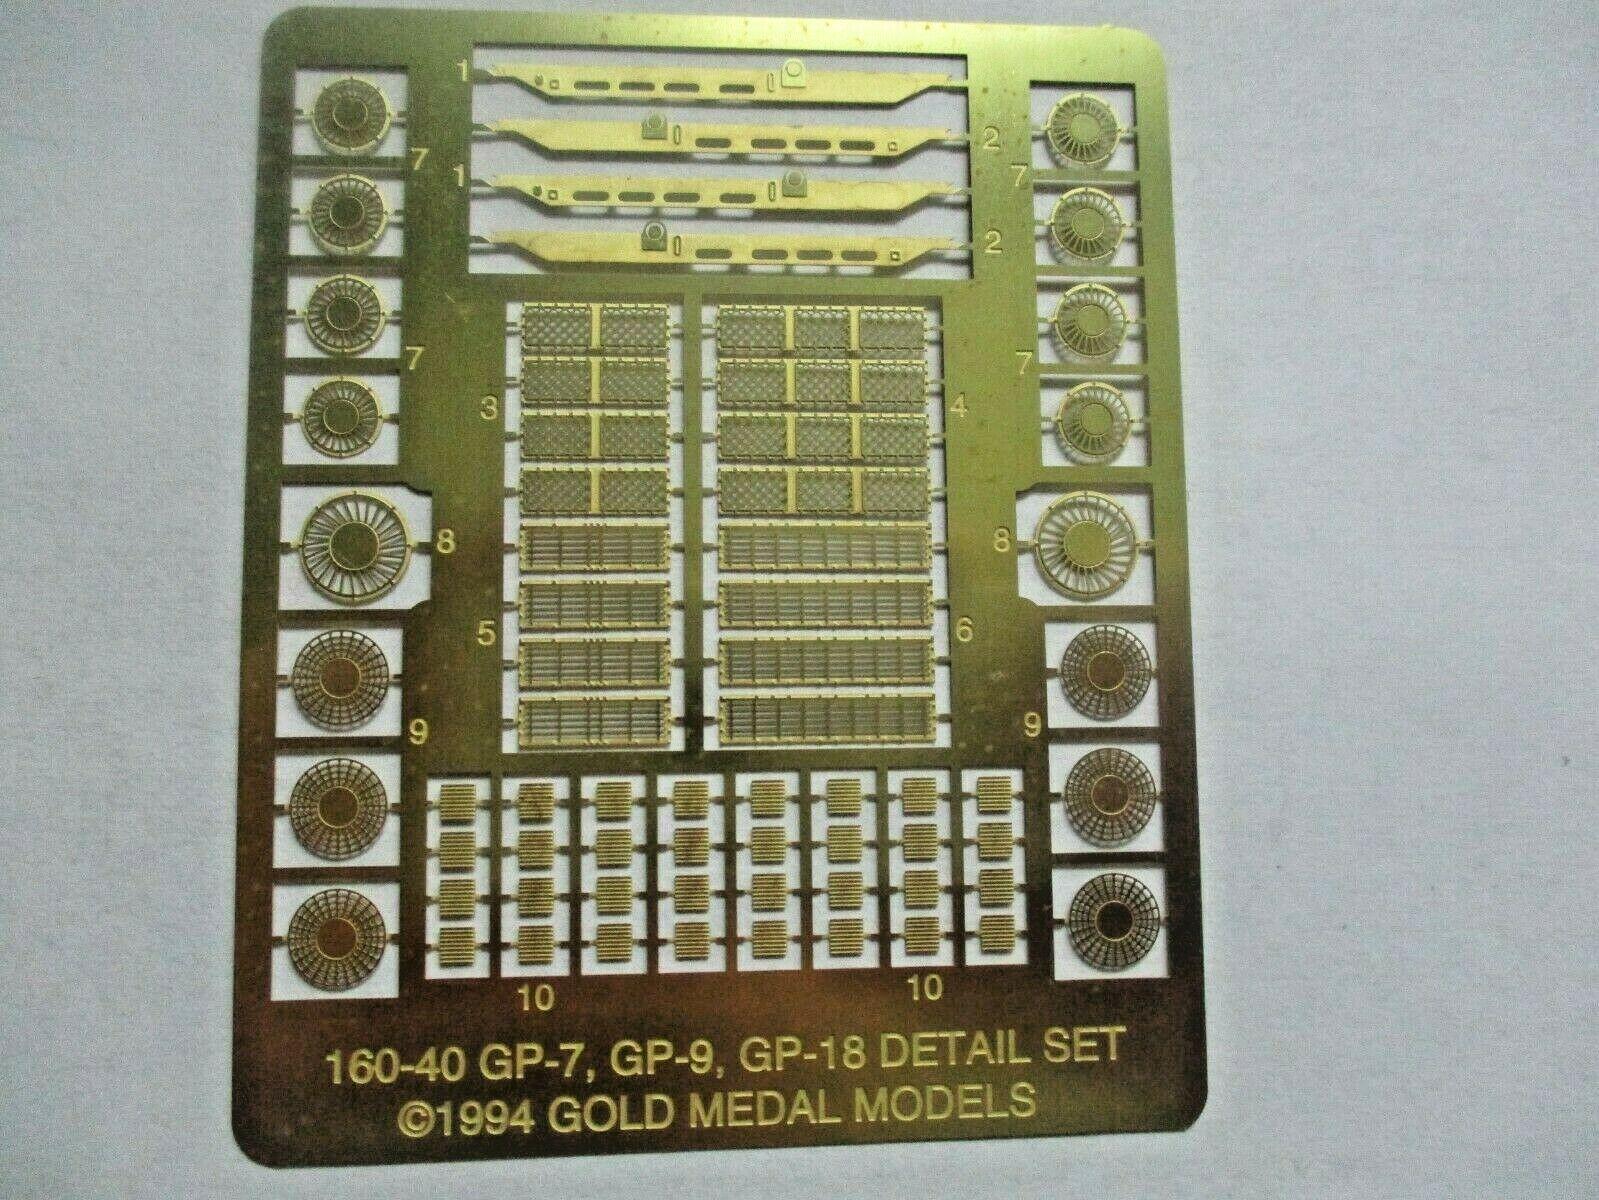 Gold Medal Models # 160-40 Life-Like Detail Set GP-18 GP-18 to GP-7 0r-9 (N)